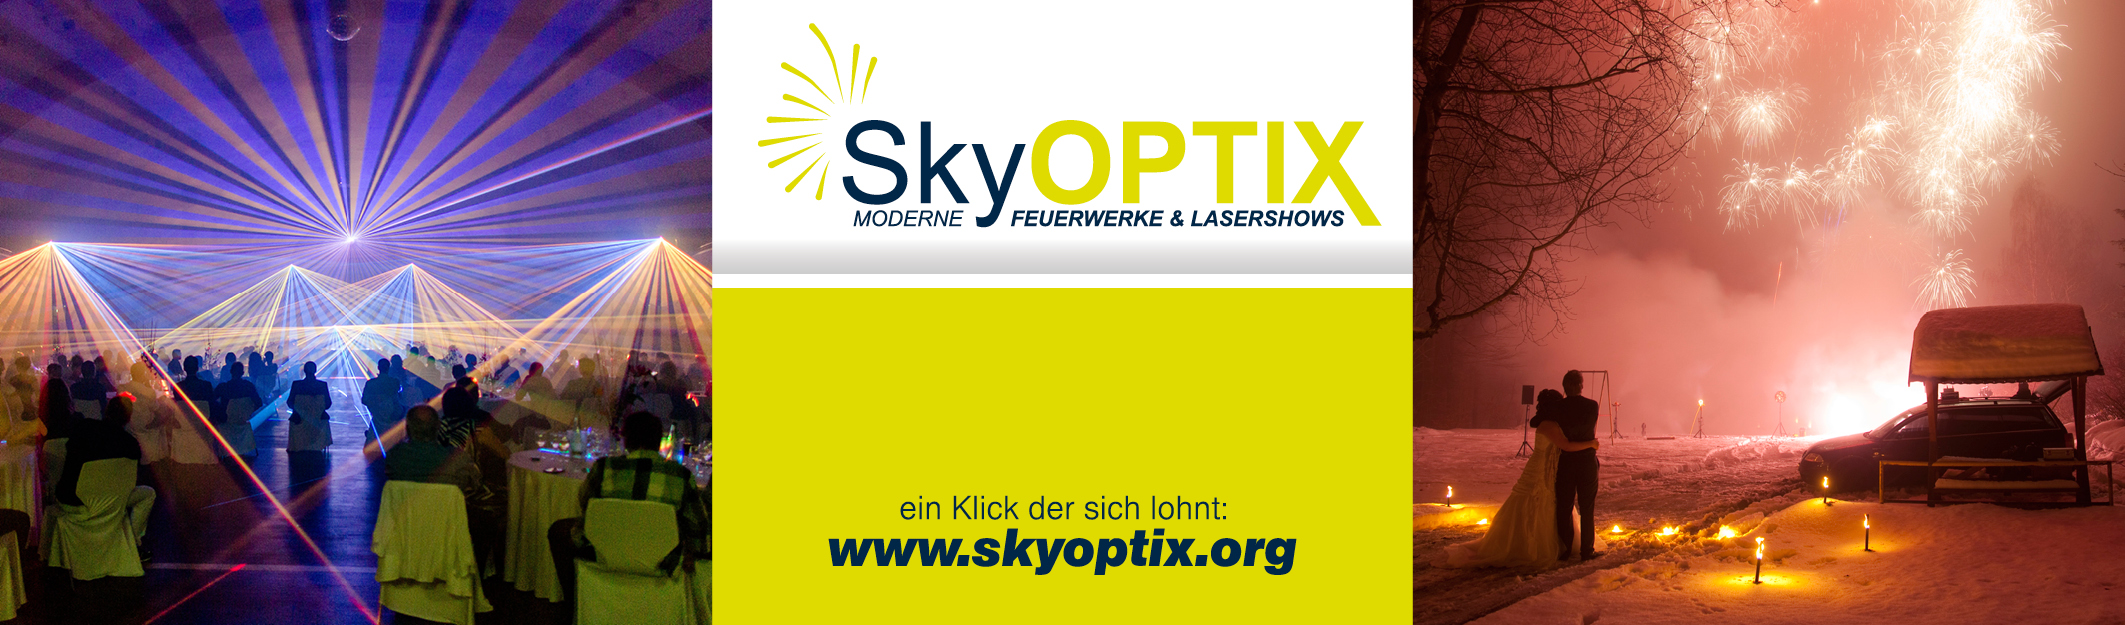 Skyoptix